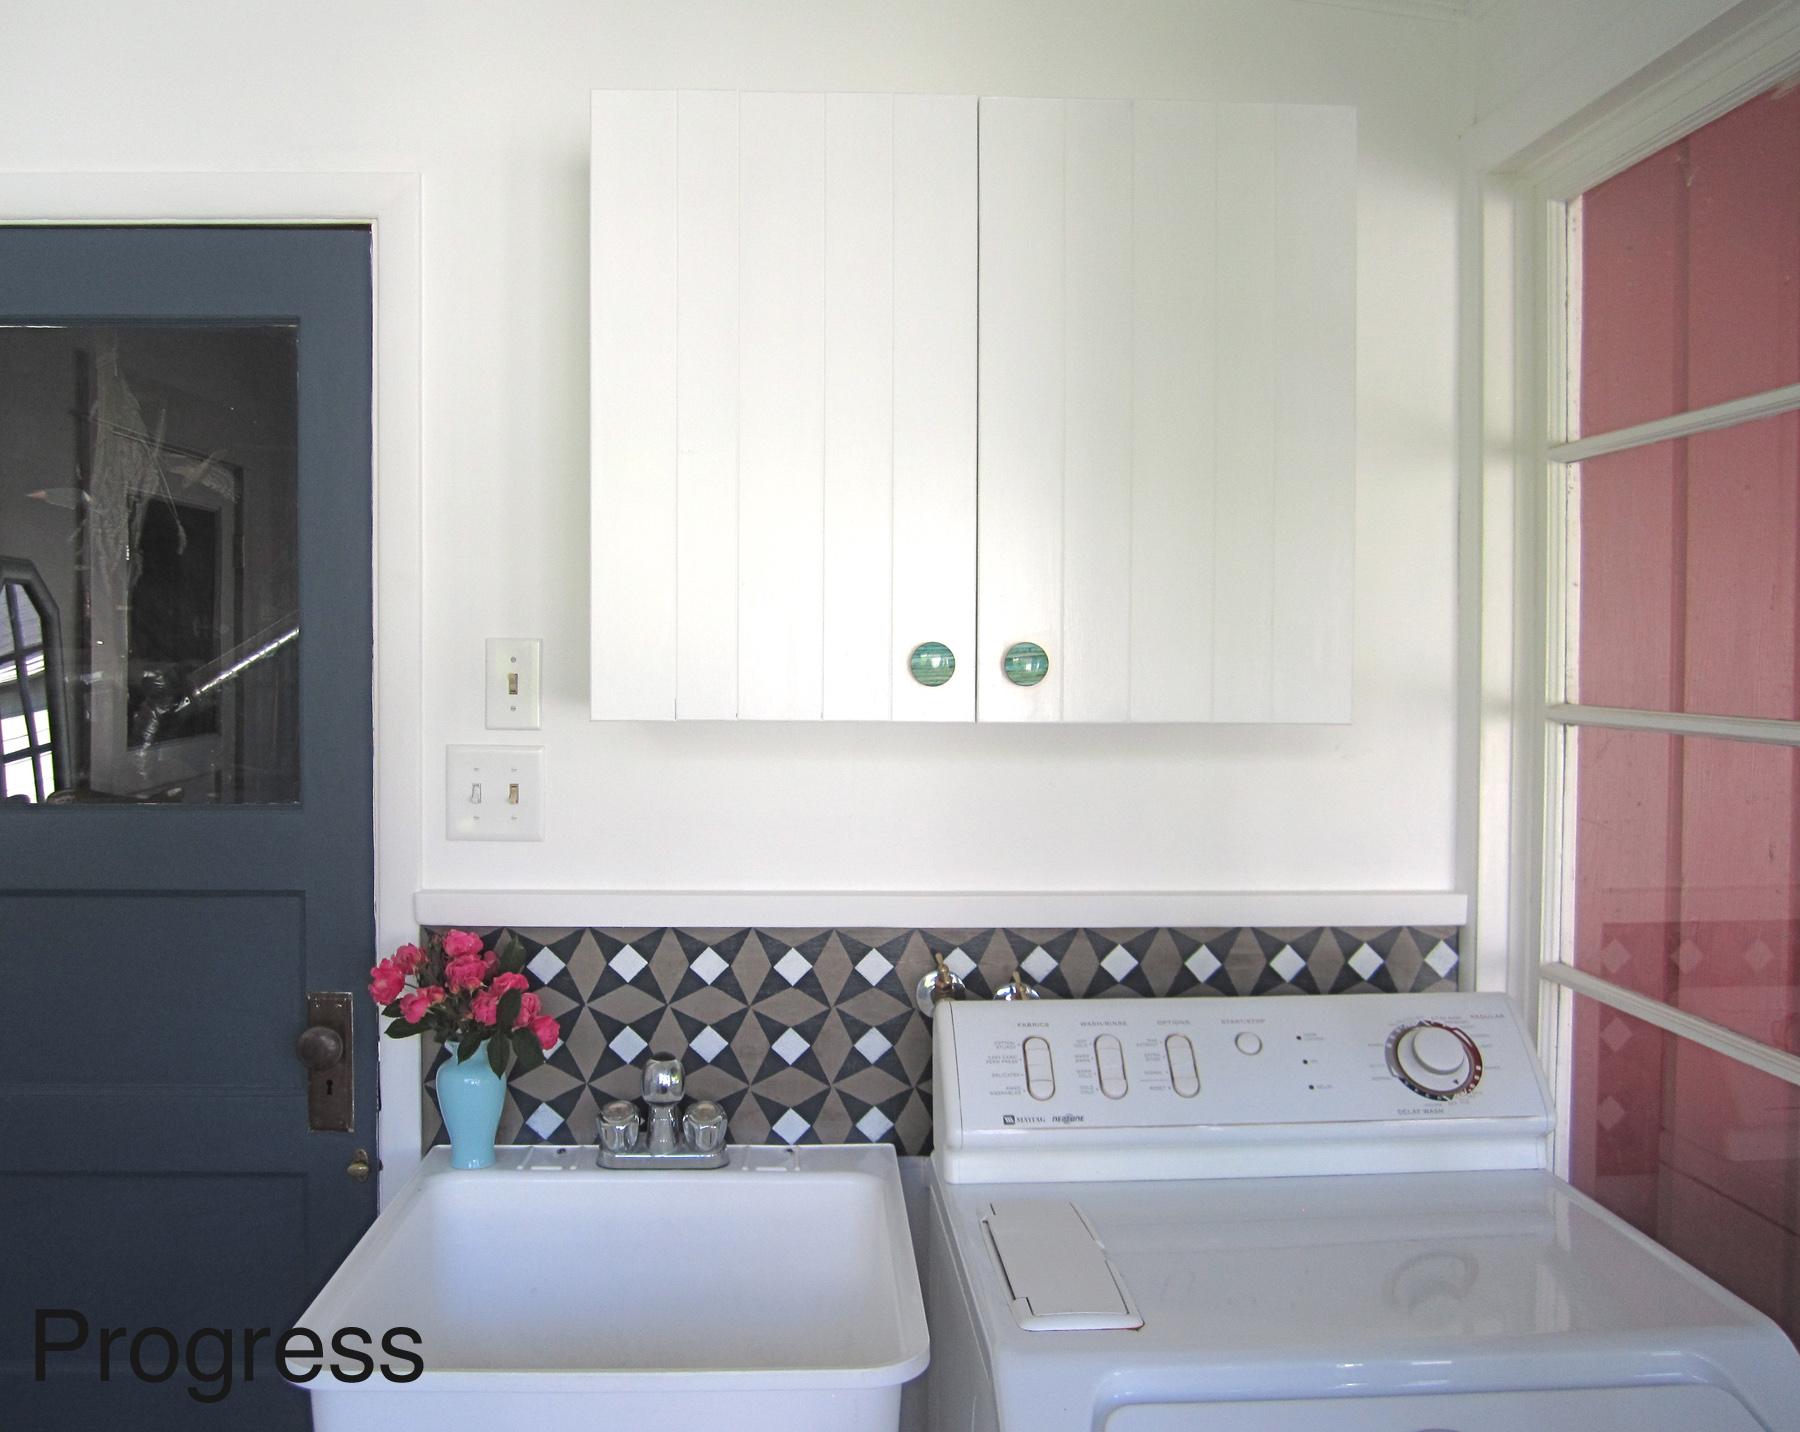 Laundry Room Progress with DIY backsplash